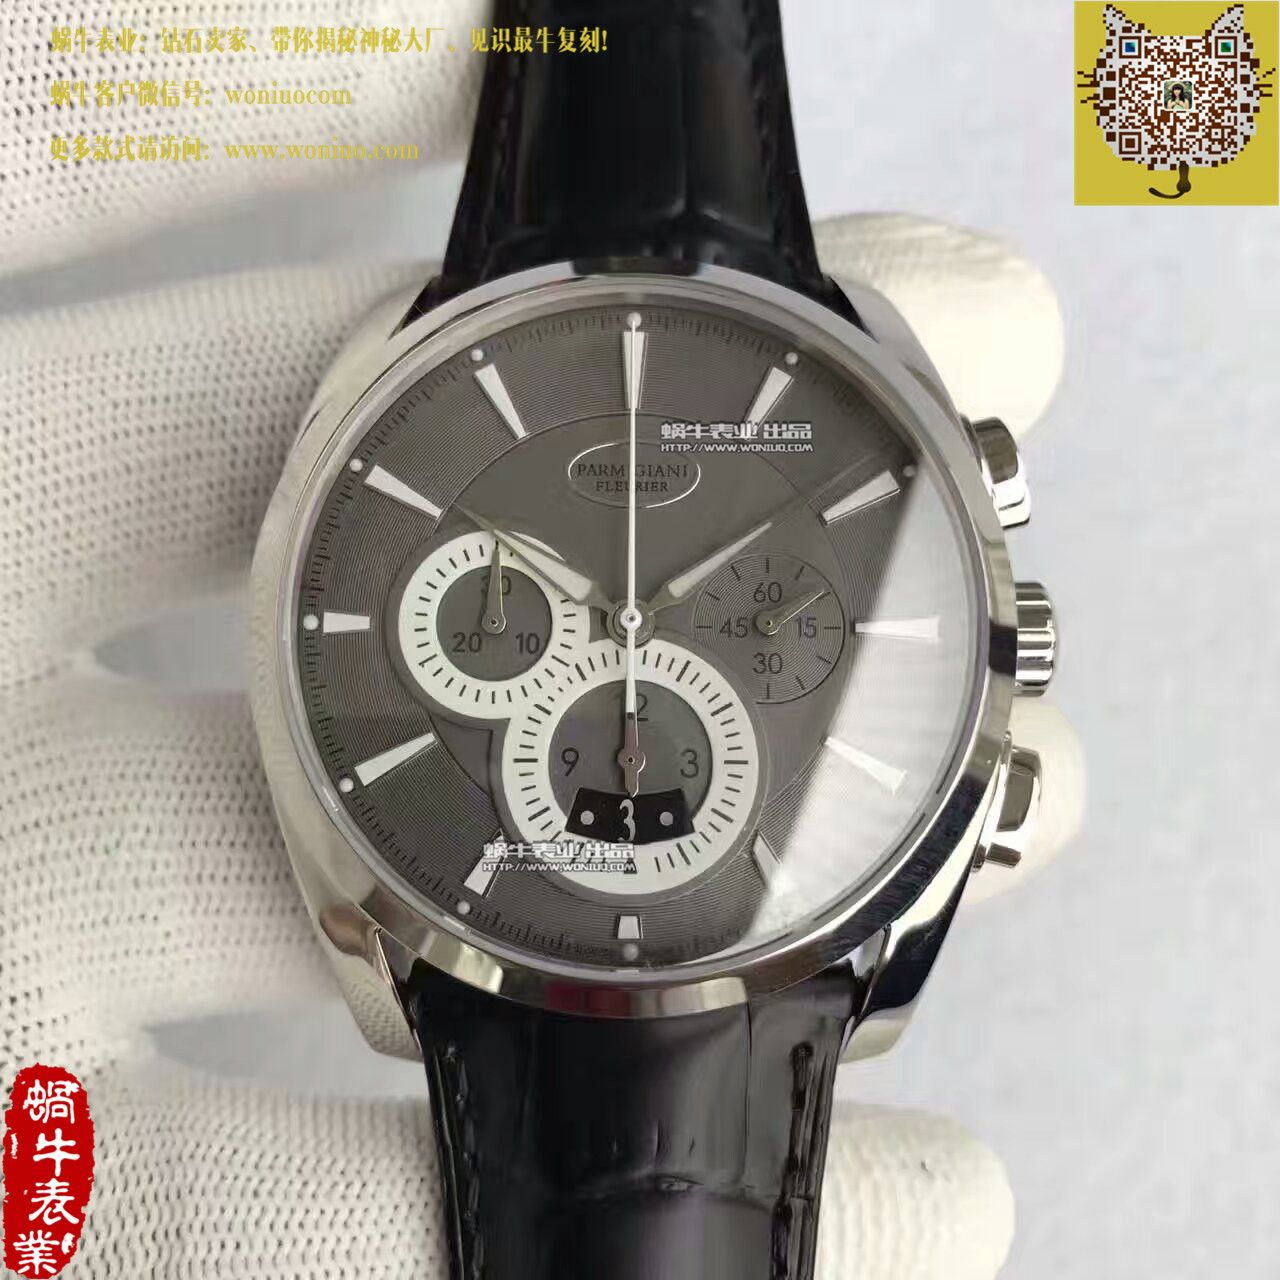 【VF厂顶级复刻一比一精仿手表】帕玛强尼Tonda系列PFC274-0002400-HE6042腕表 / PM027